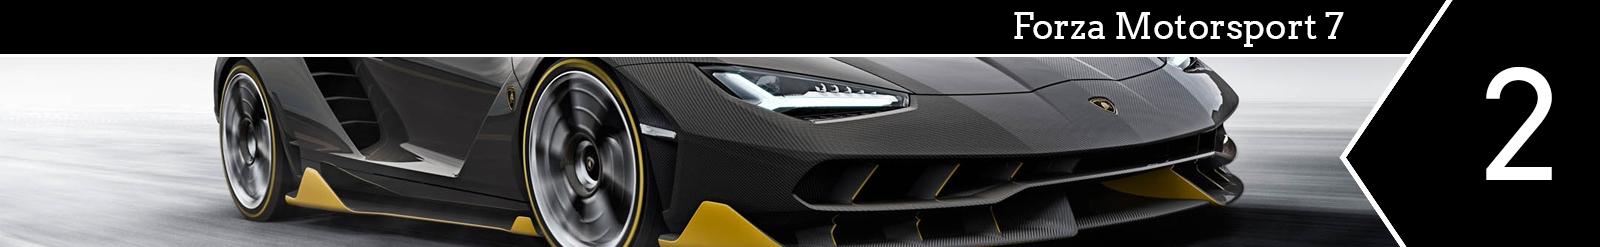 2_Forza_Motorsport_7